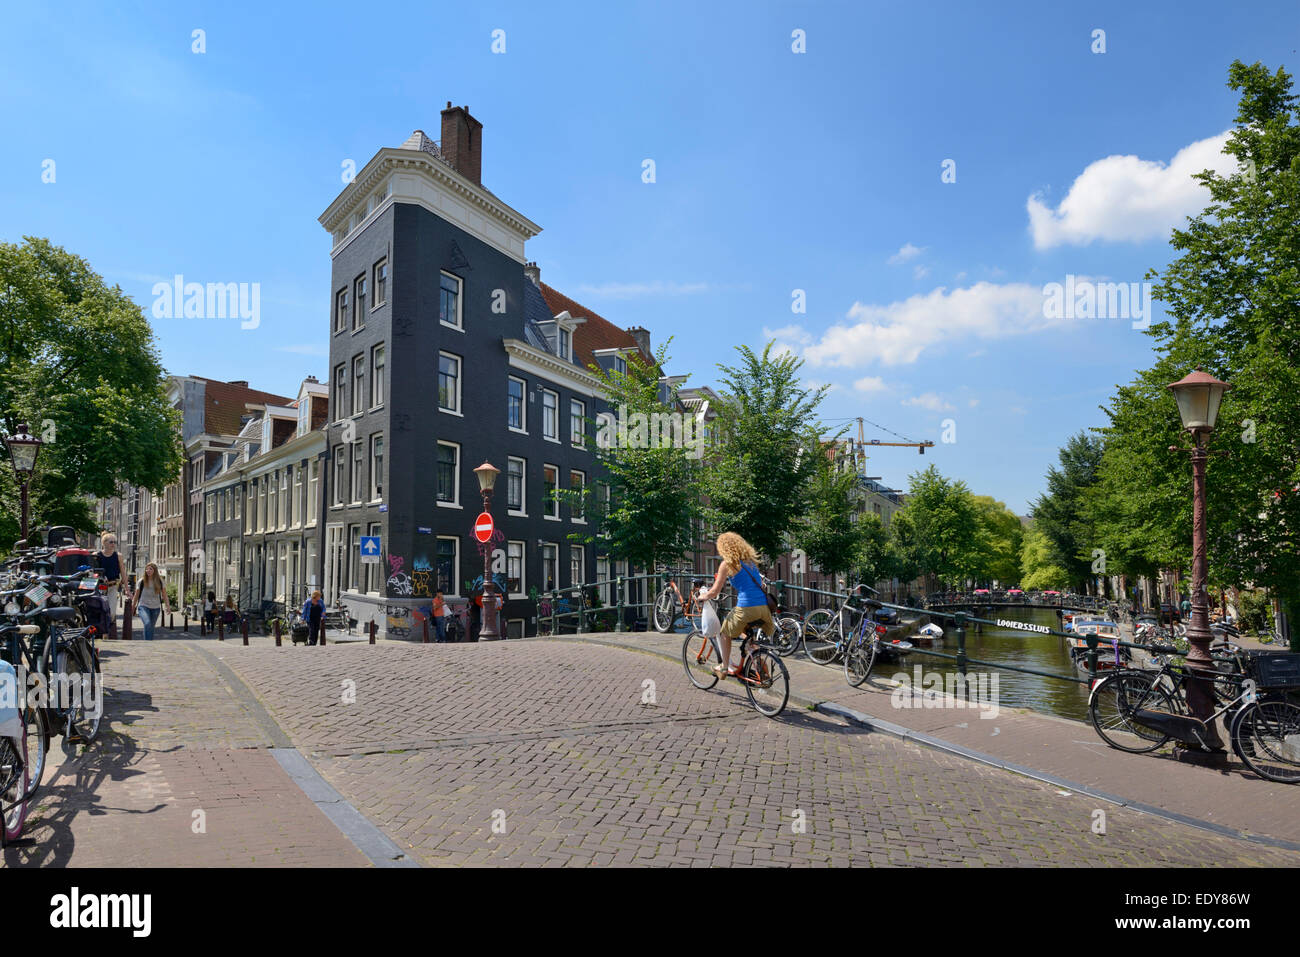 Canal bridge, Prinsengracht, Amsterdam, North Holland, Netherlands, Europe - Stock Image